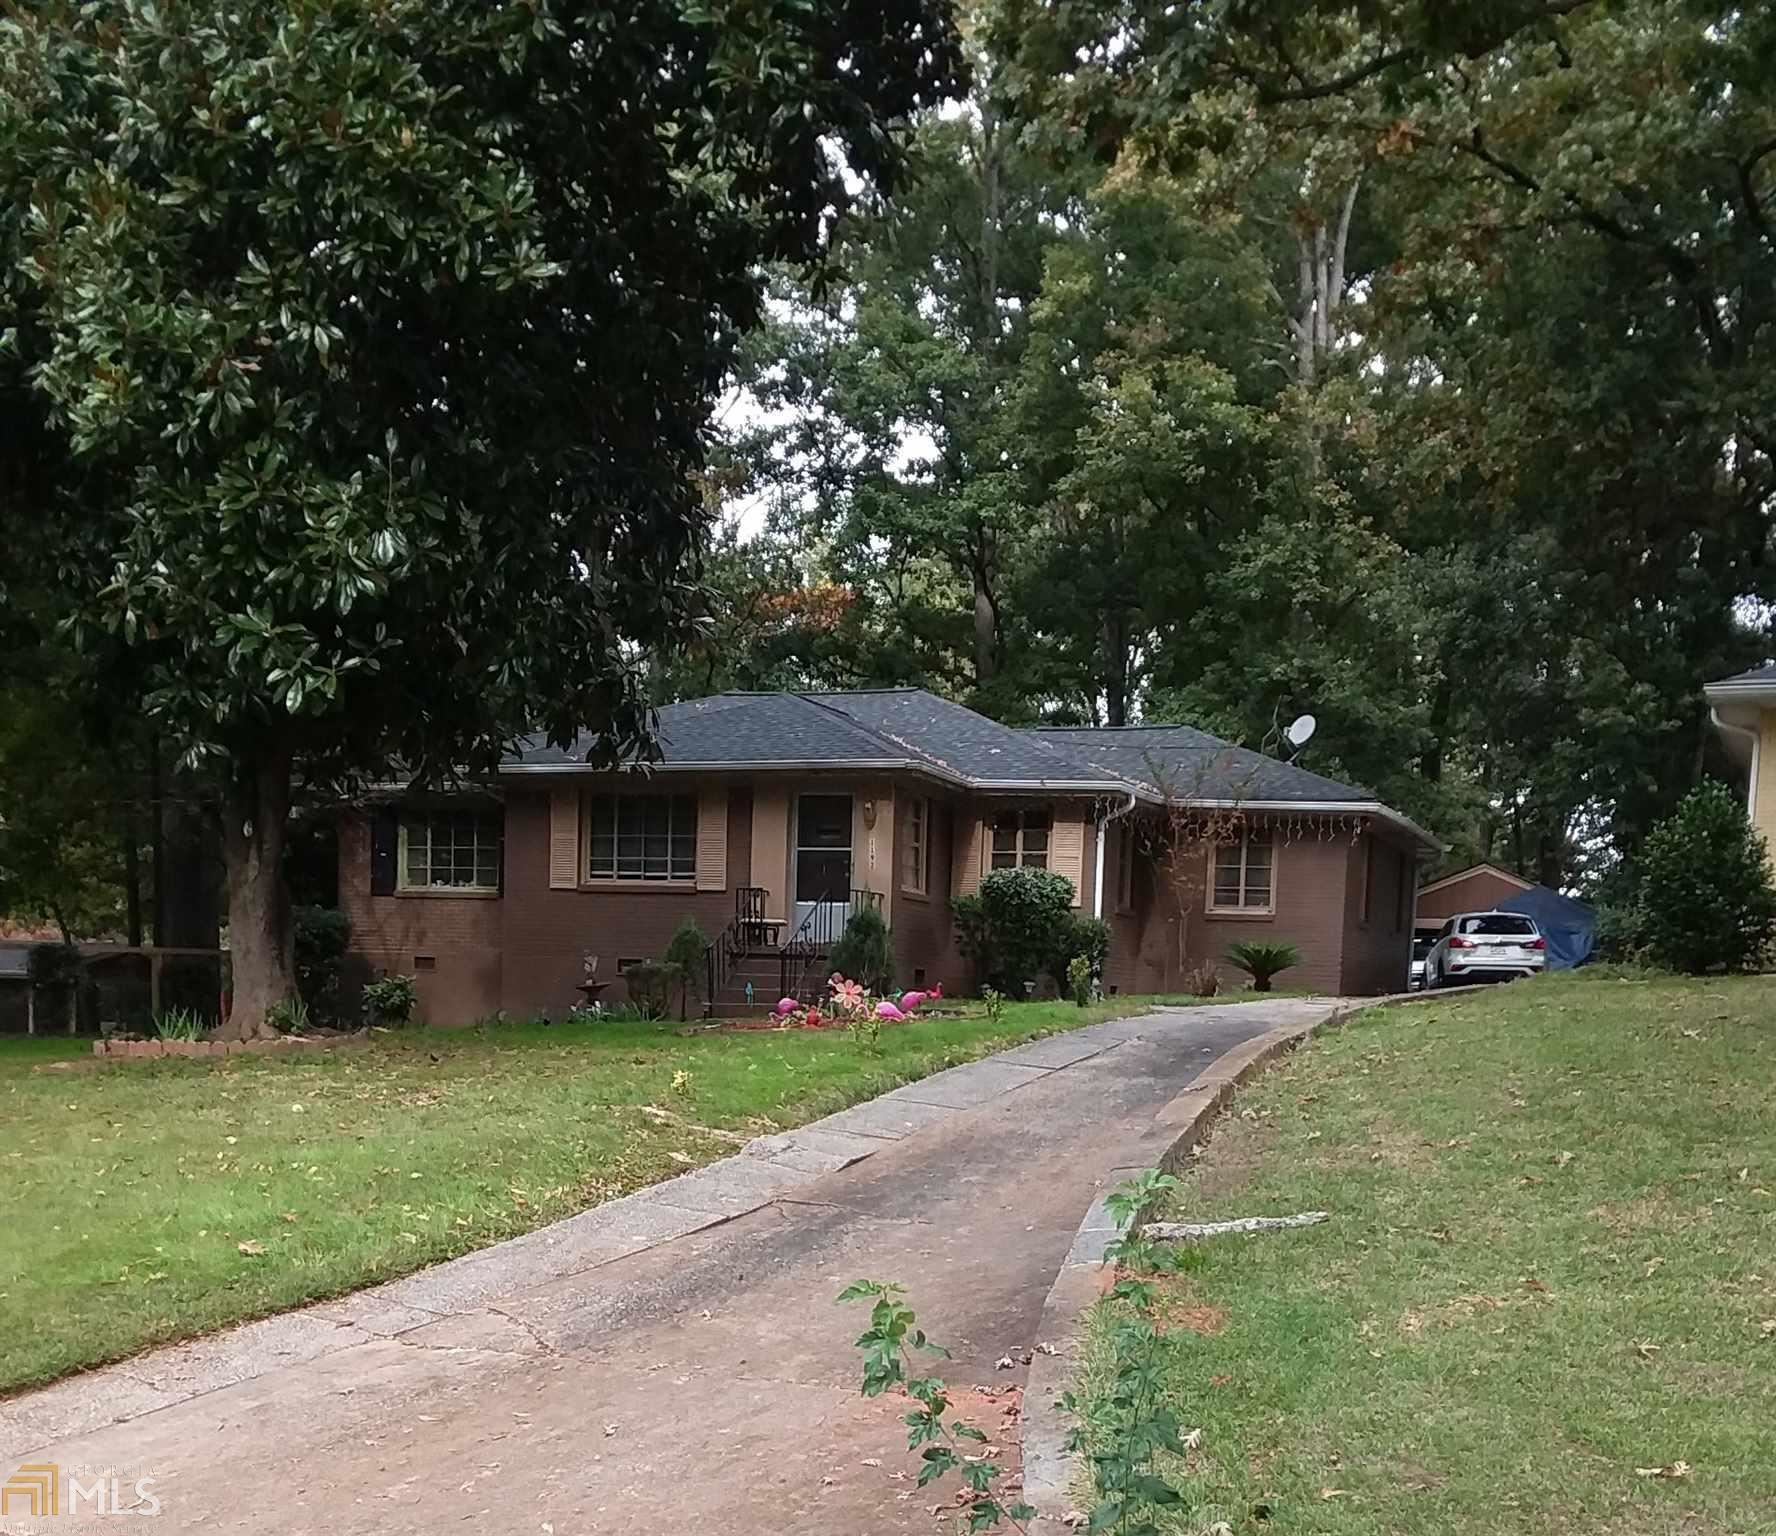 1192 SE Crestwood Dr, Atlanta, GA 30316 - #: 8688652